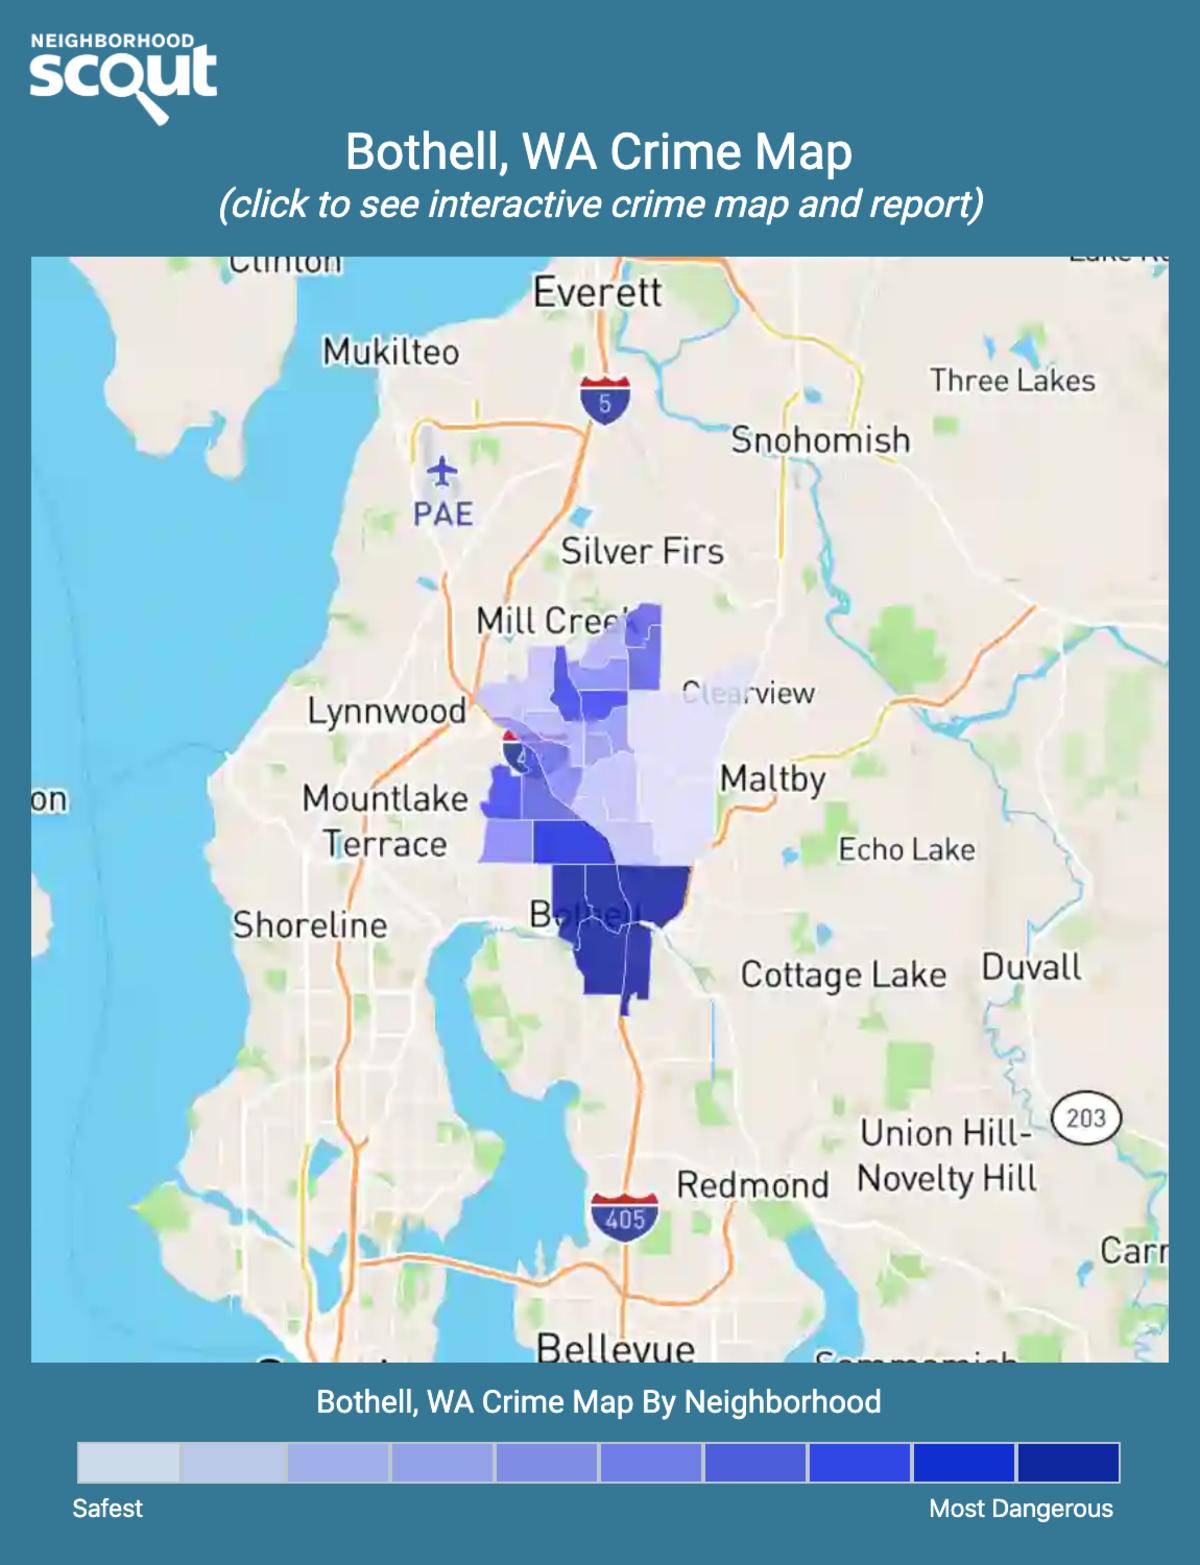 Bothell, Washington crime map